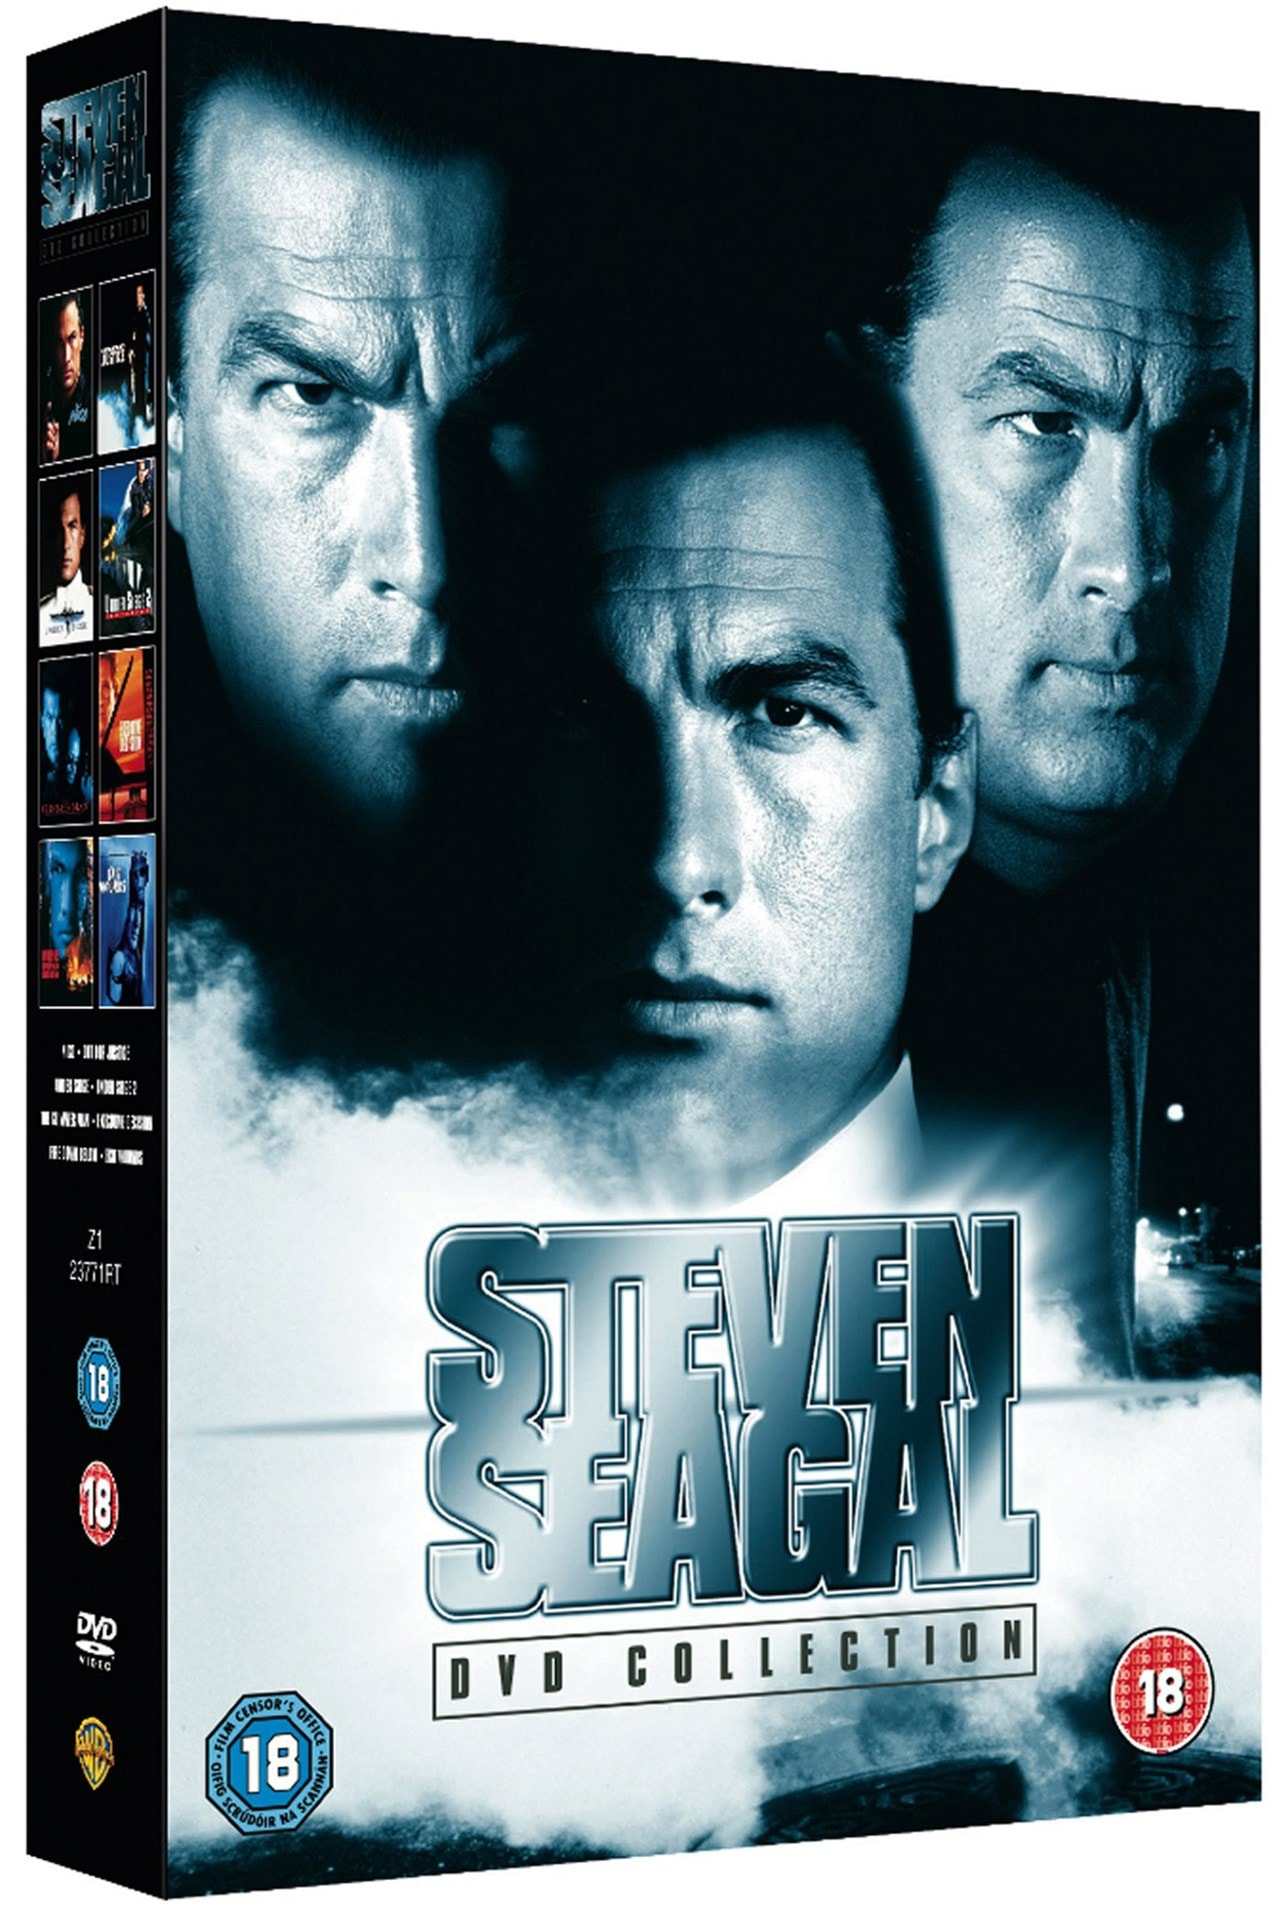 The Steven Seagal Legacy - 2